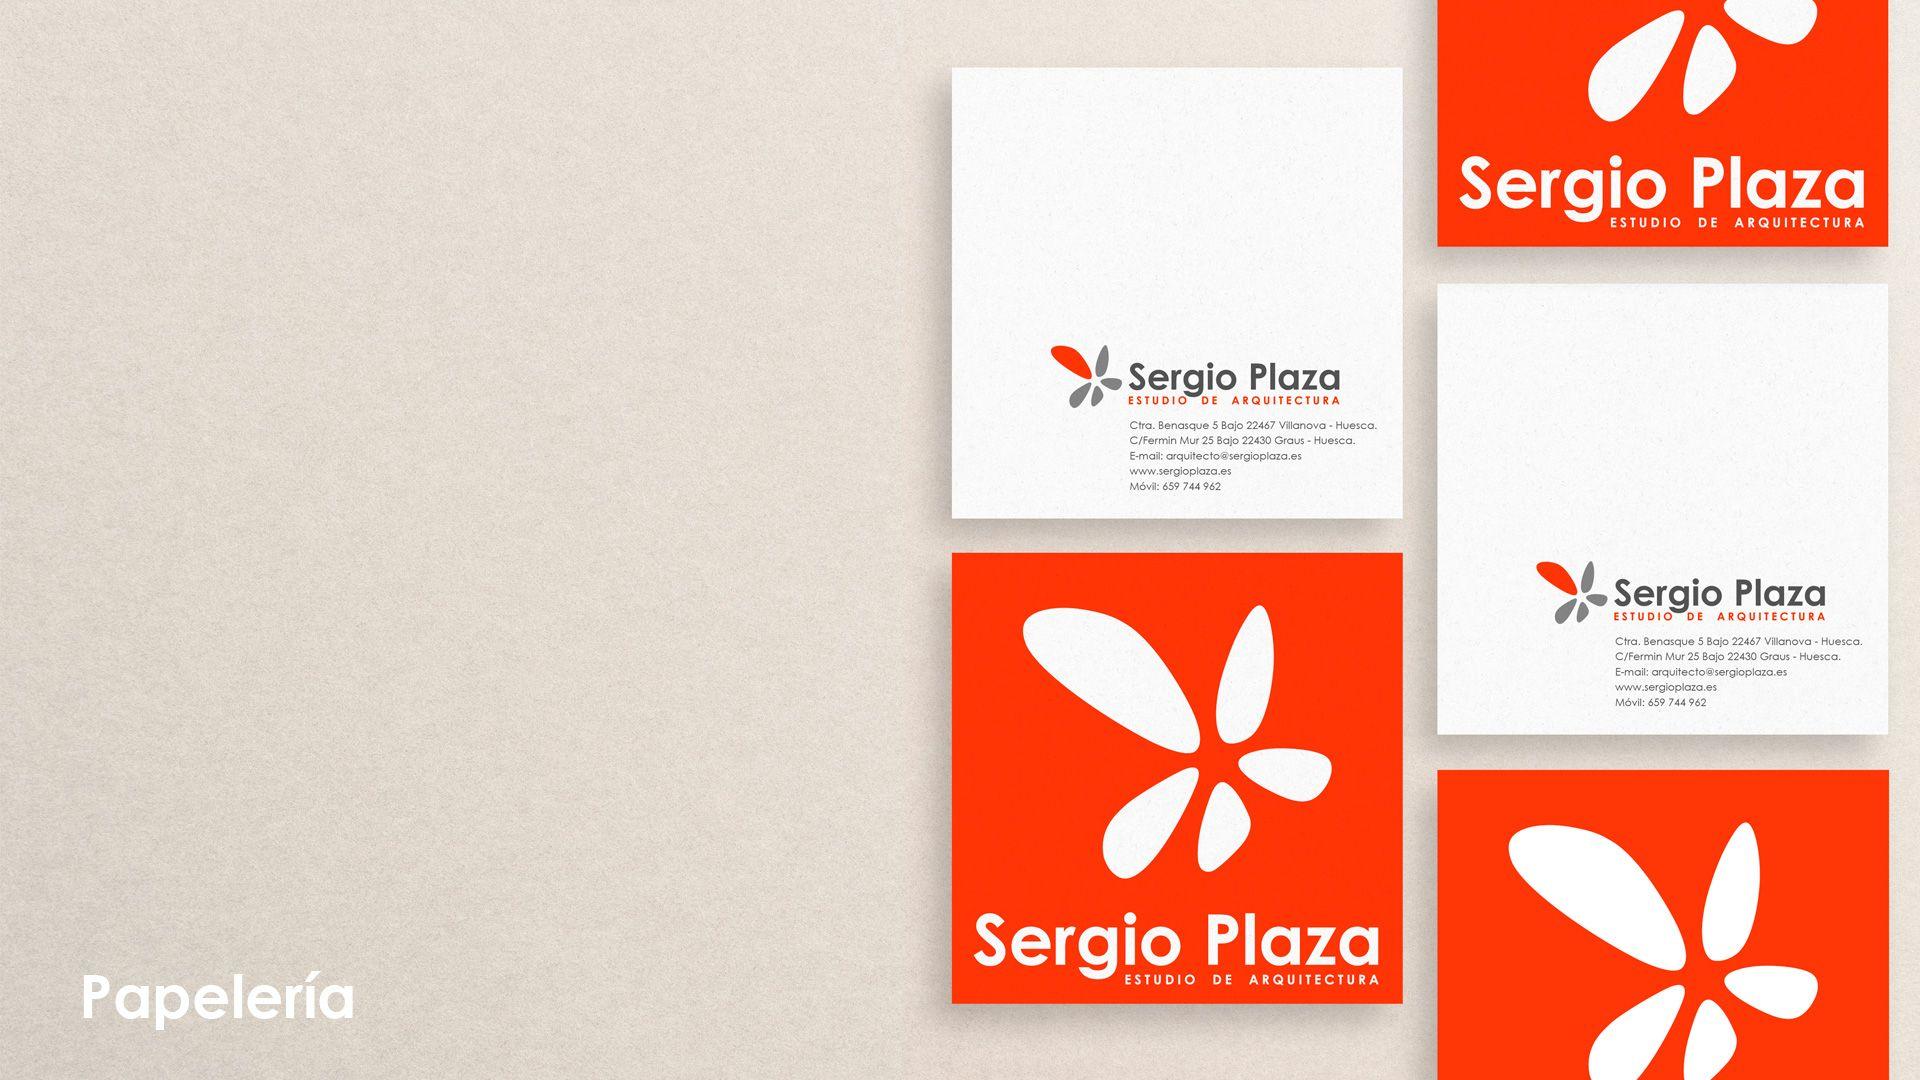 Papelería Sergio Plaza Arquitecto